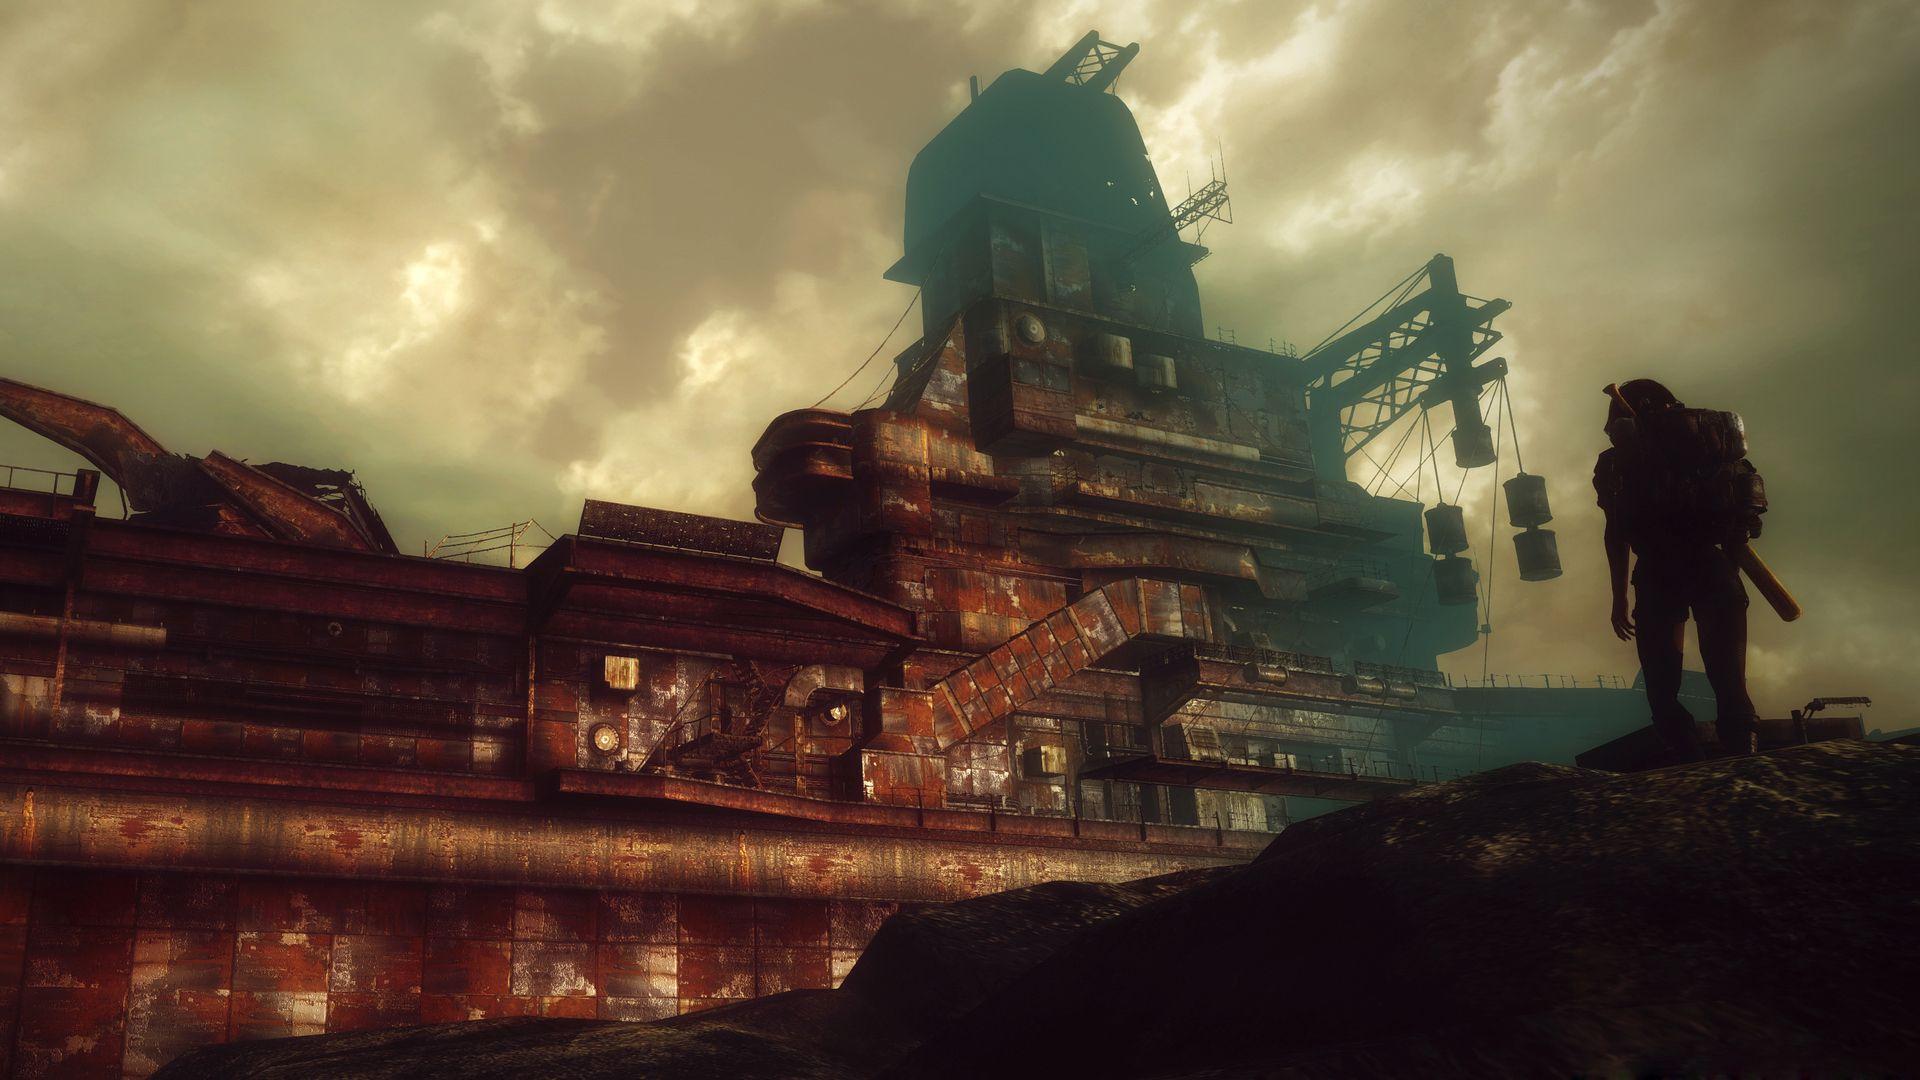 Fallout 3 Wallpapers Full Hd Fallout 3 Wallpaper Wallpaper Fallout 3